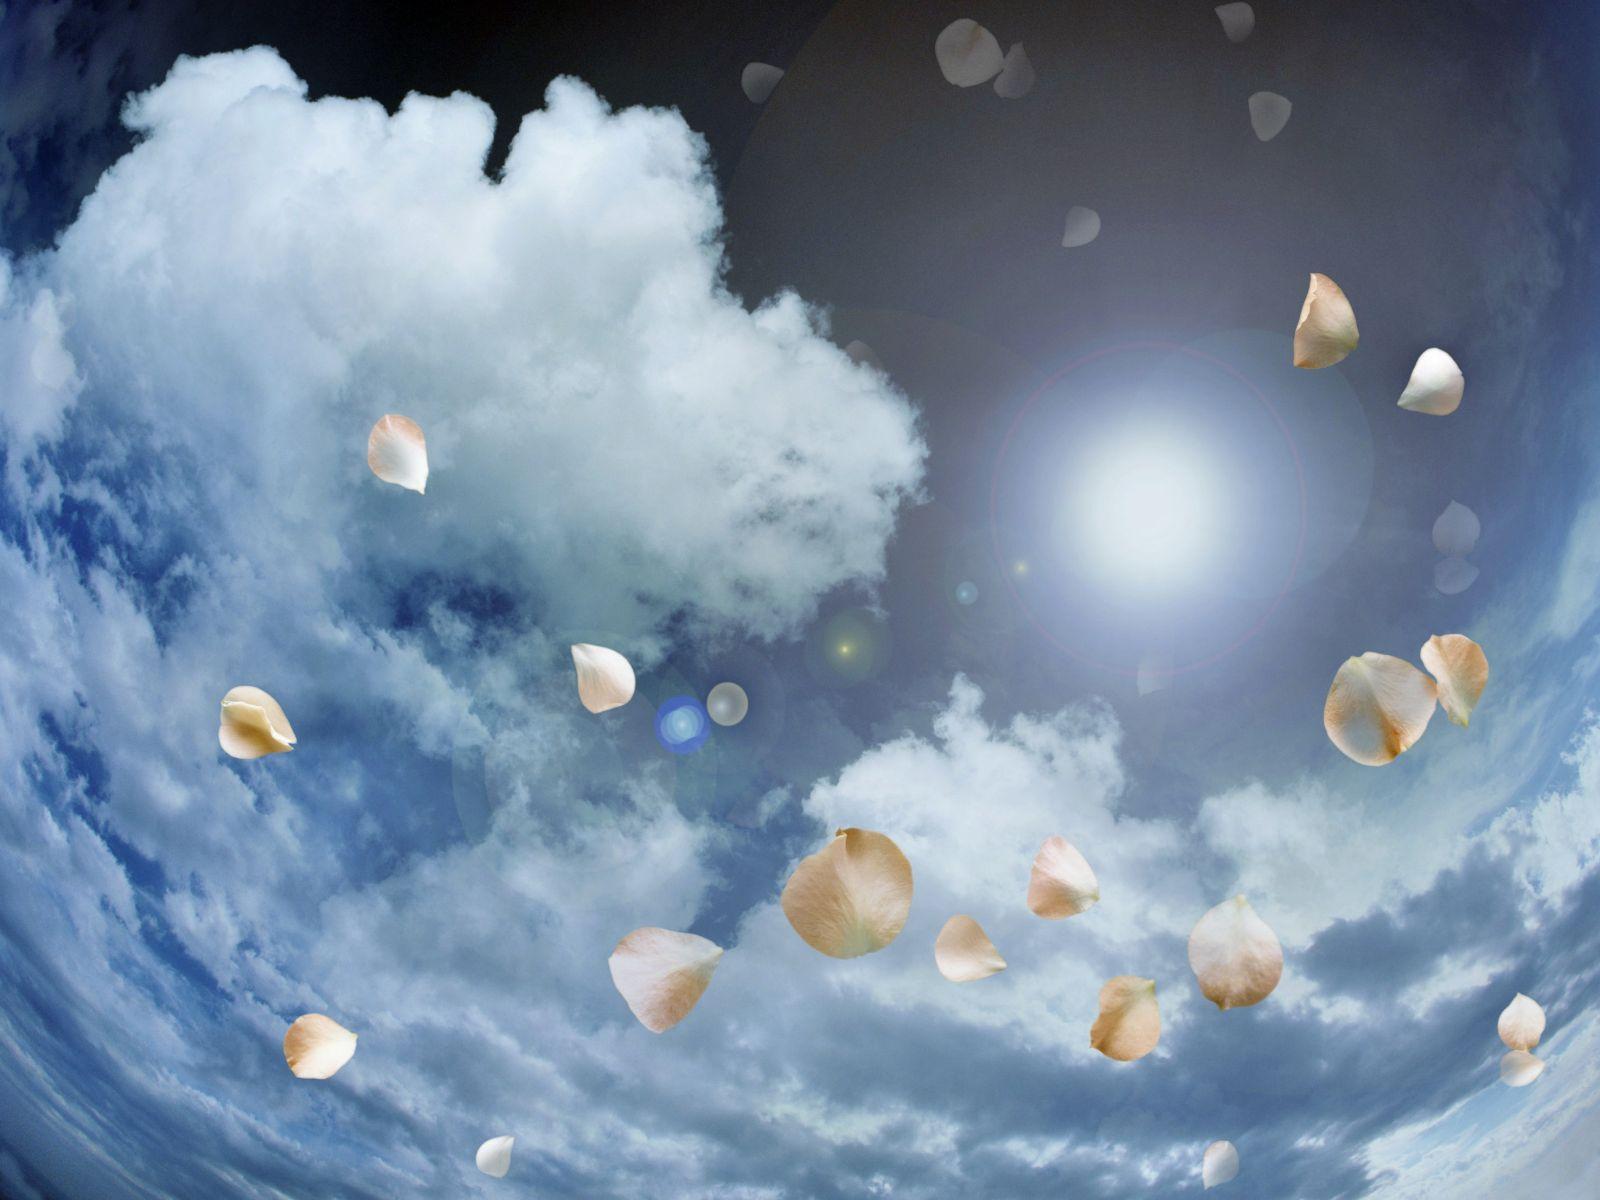 Фон для открытки облака